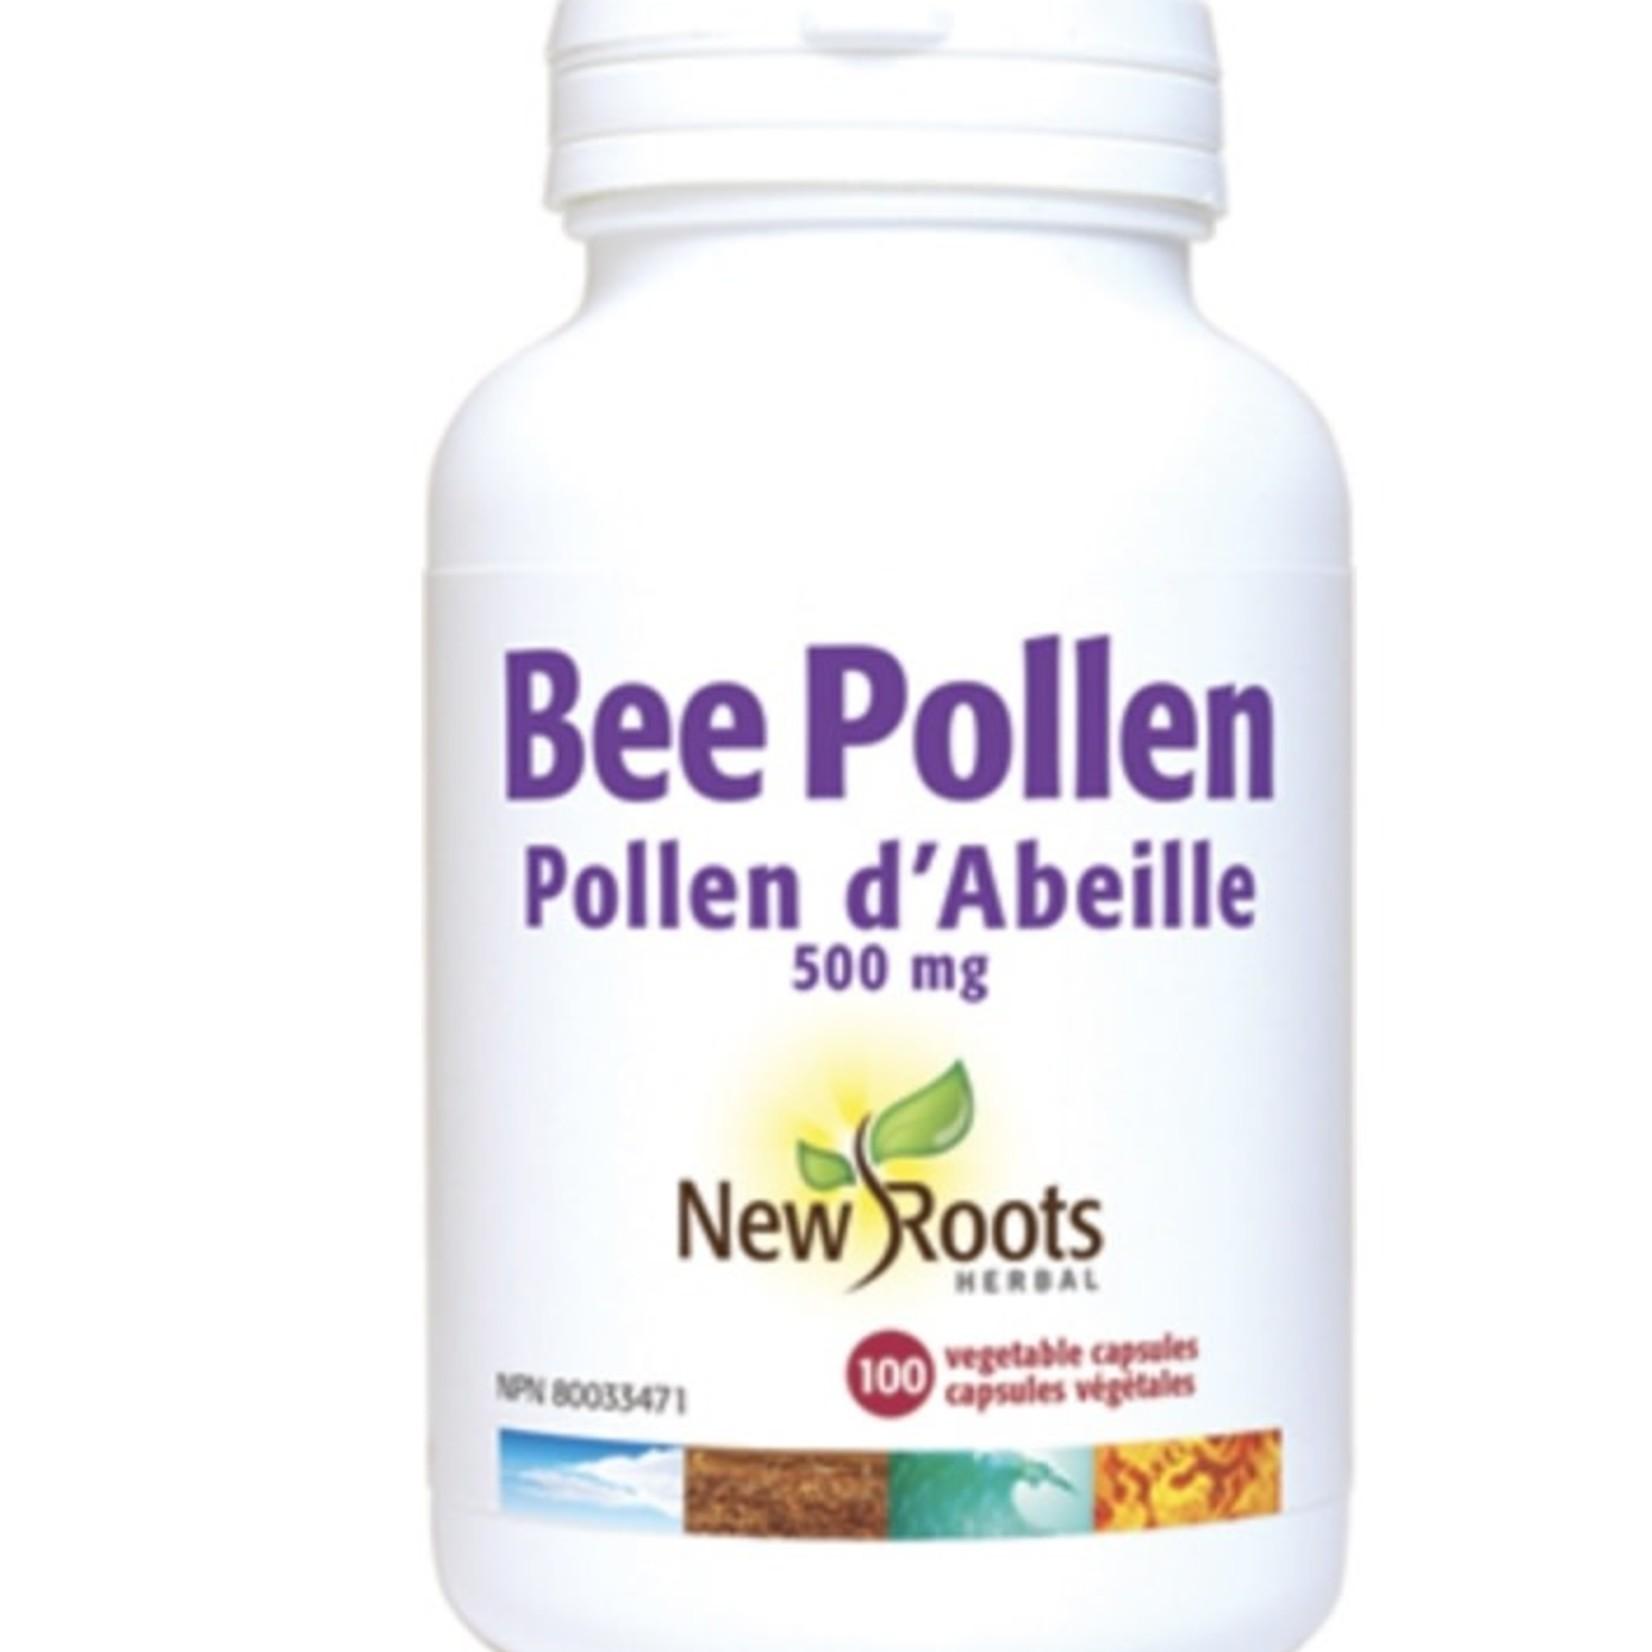 New Roots New Roots Bee Pollen 500mg 100 caps